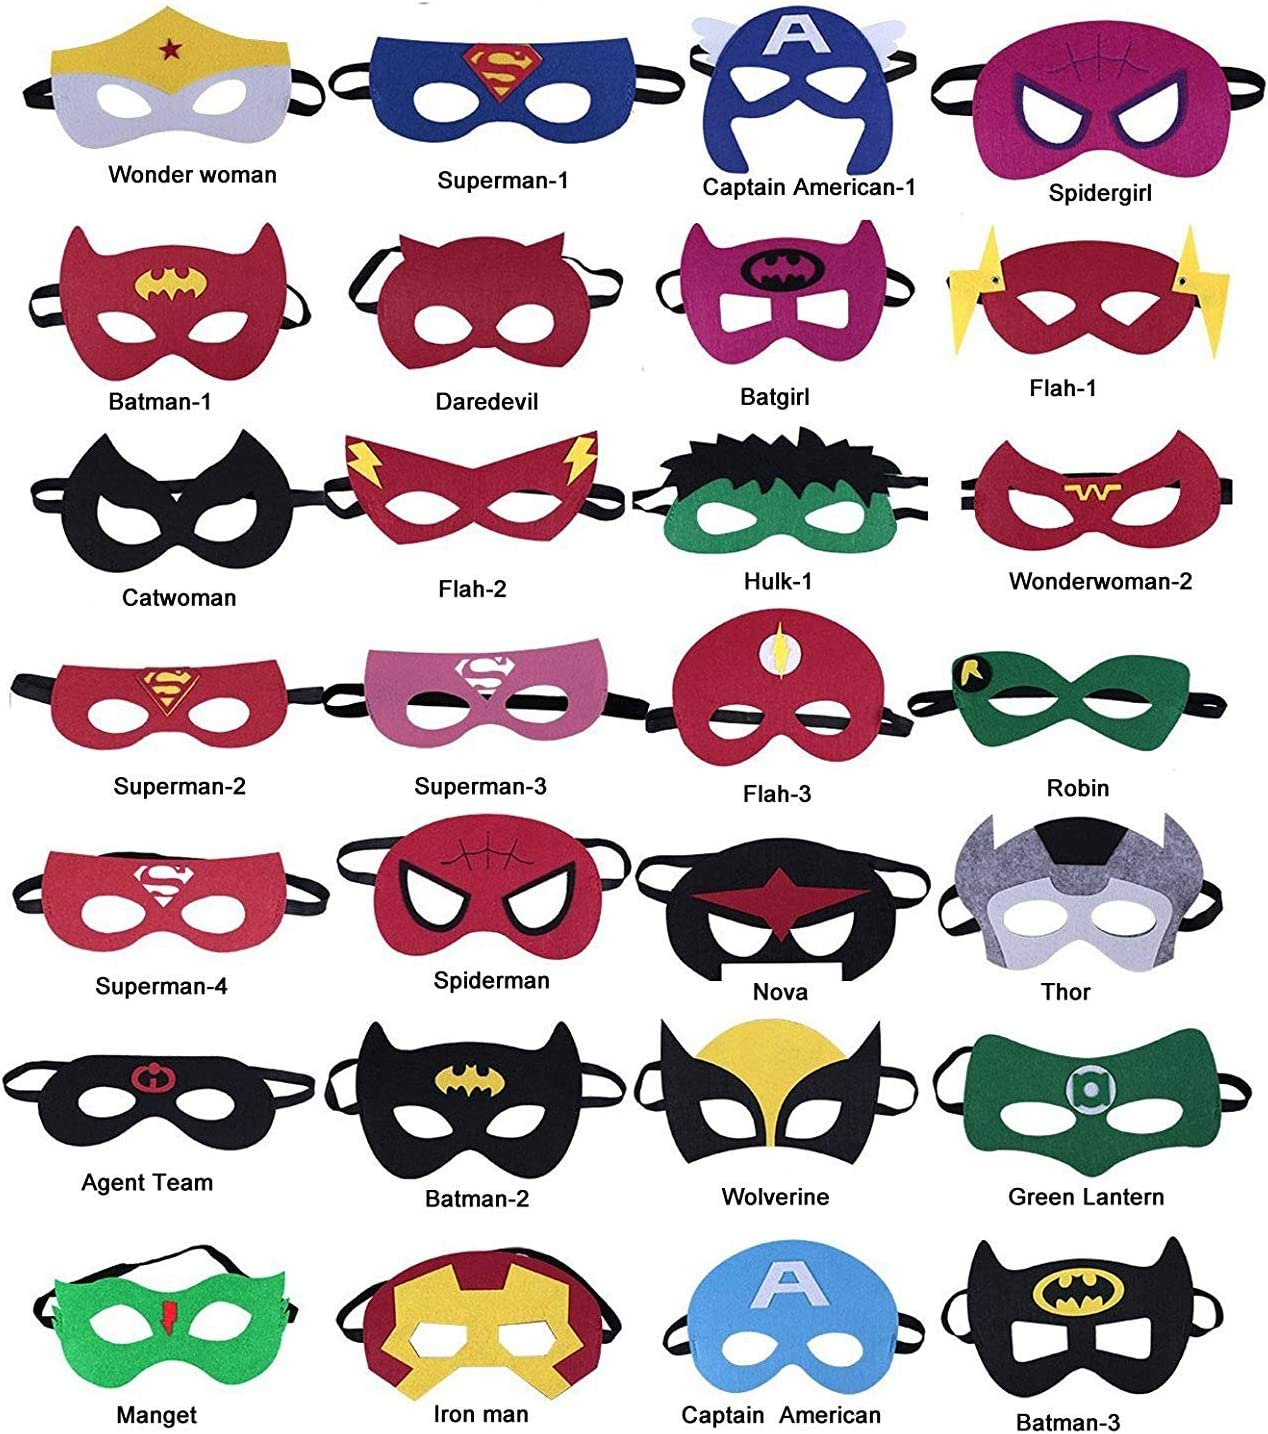 The Avengers Super Heroes Birthday Party Supplies Favors Children//Kids//Adults HXDZFX 24PCS Superhero Party Masks /& Superhero Slap Bracelet for Kids Baby